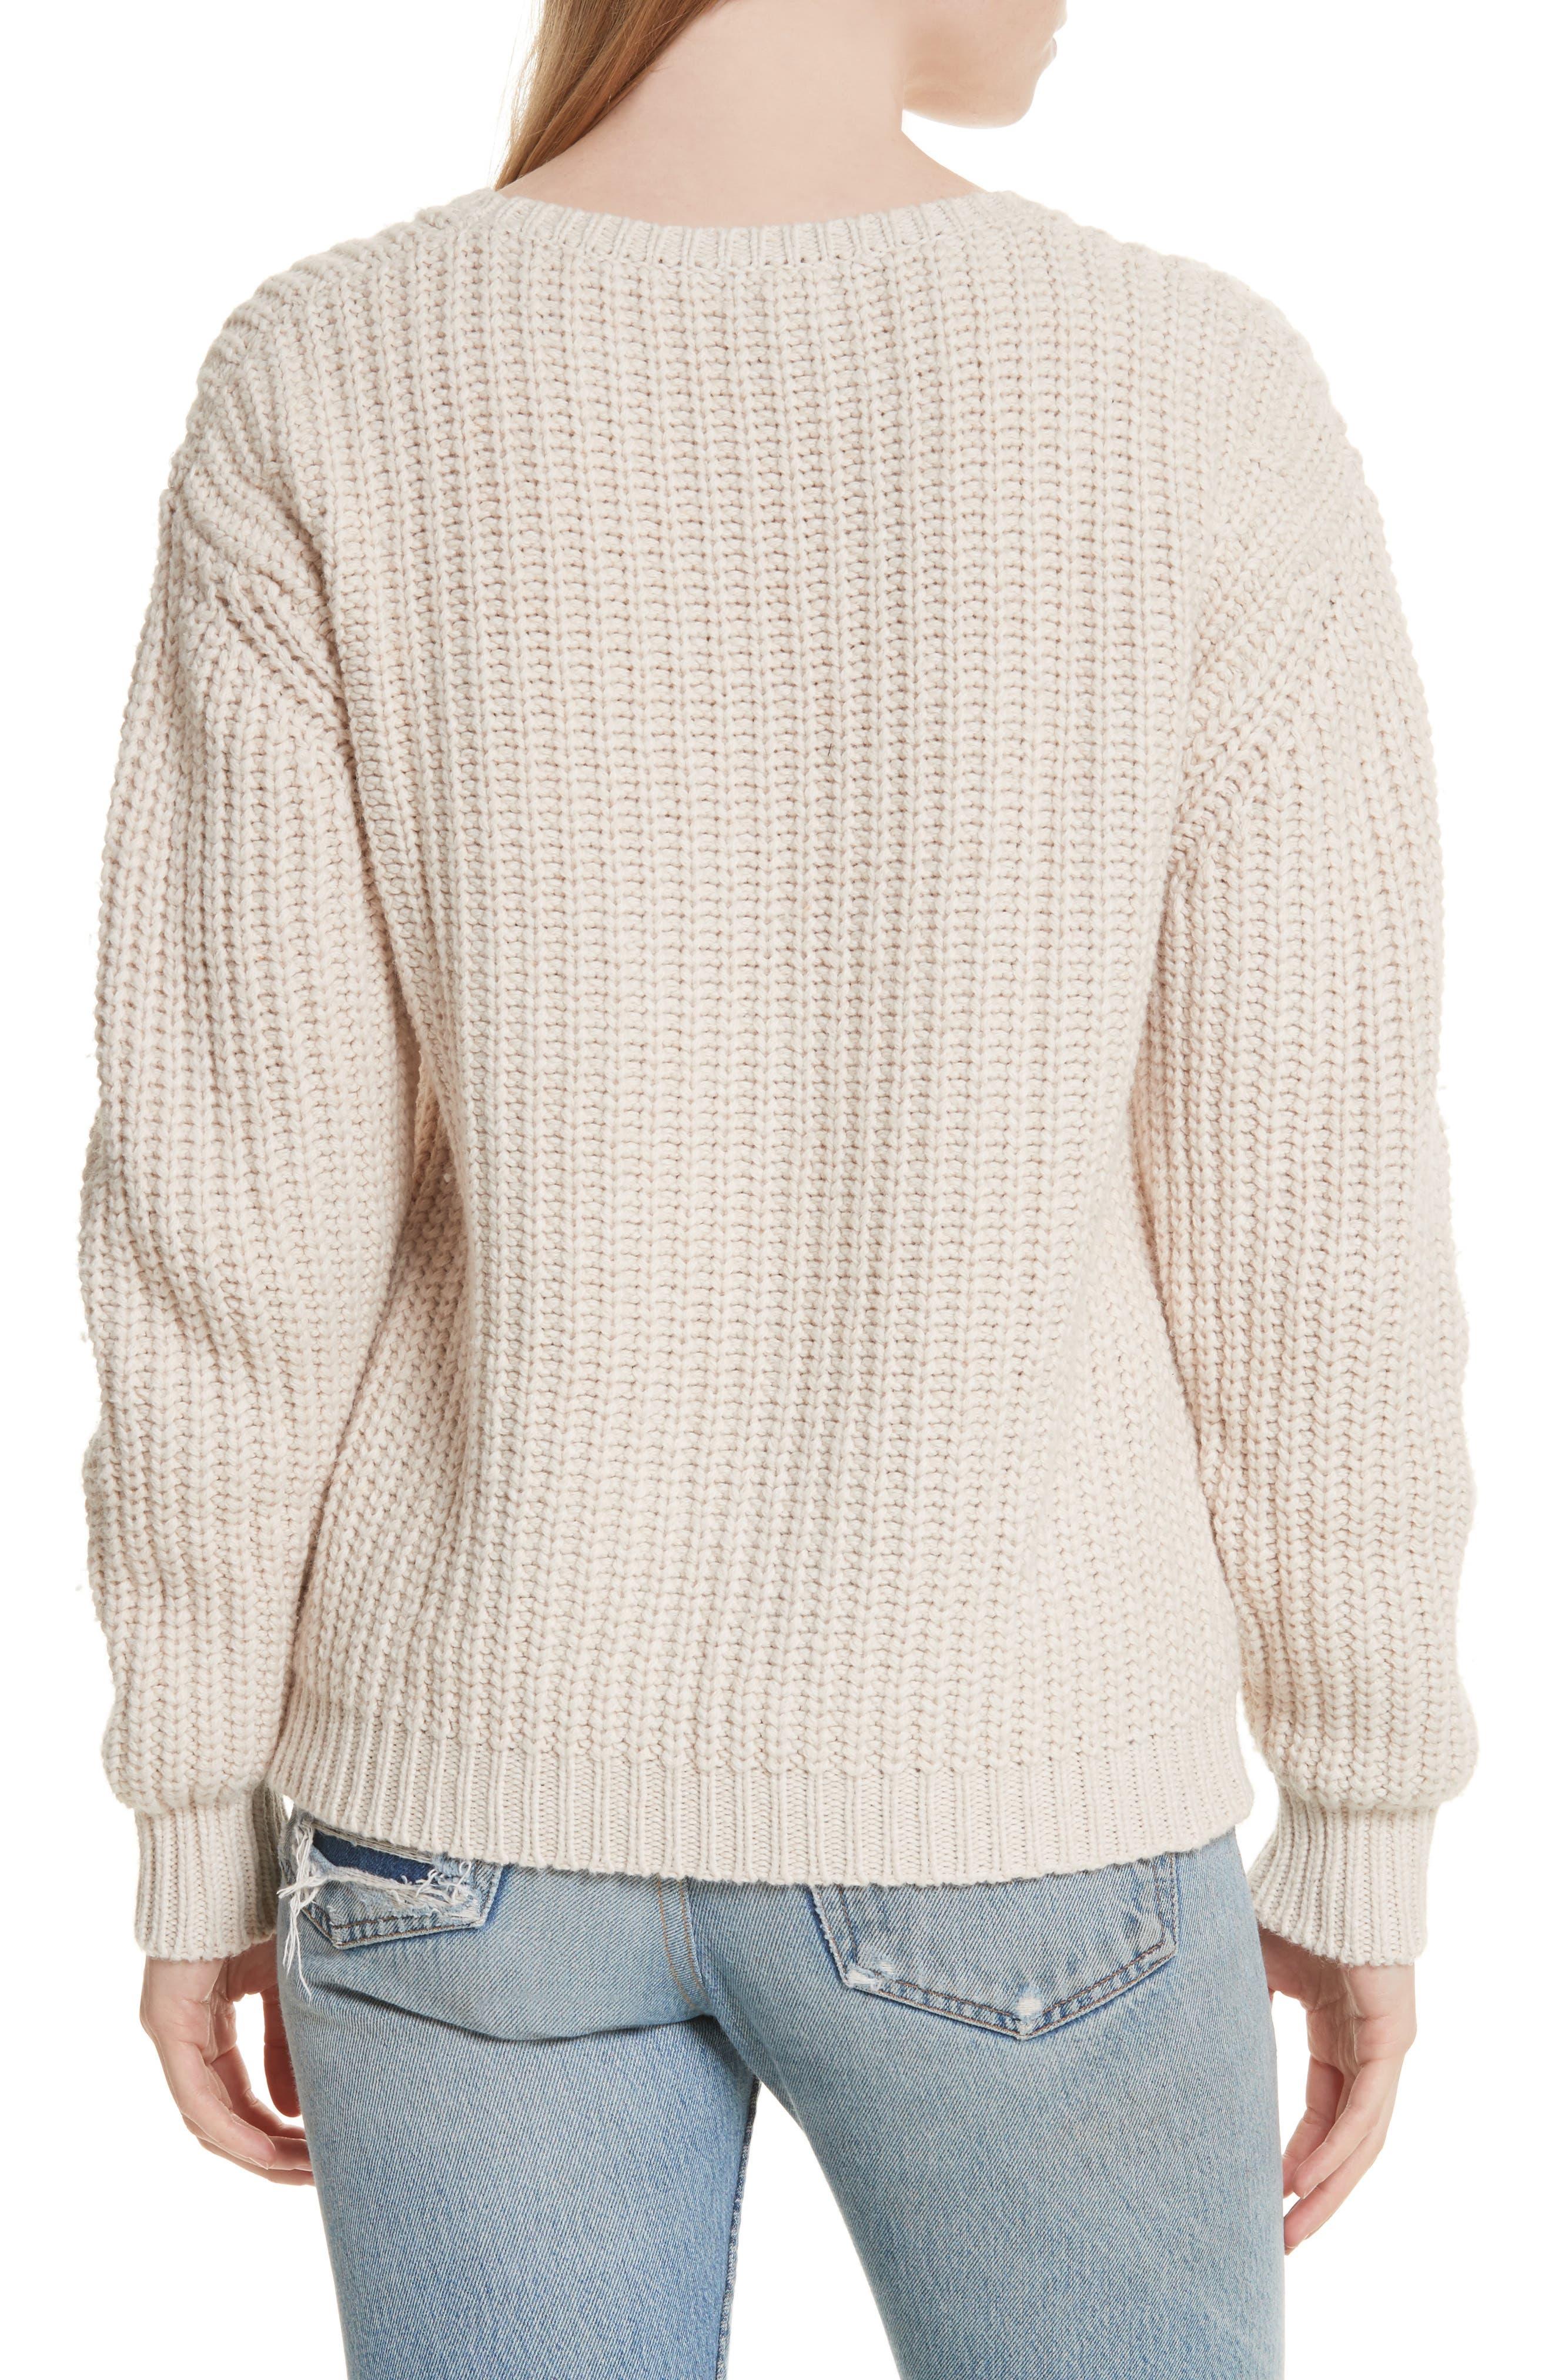 Balenne Sweater,                             Alternate thumbnail 2, color,                             277